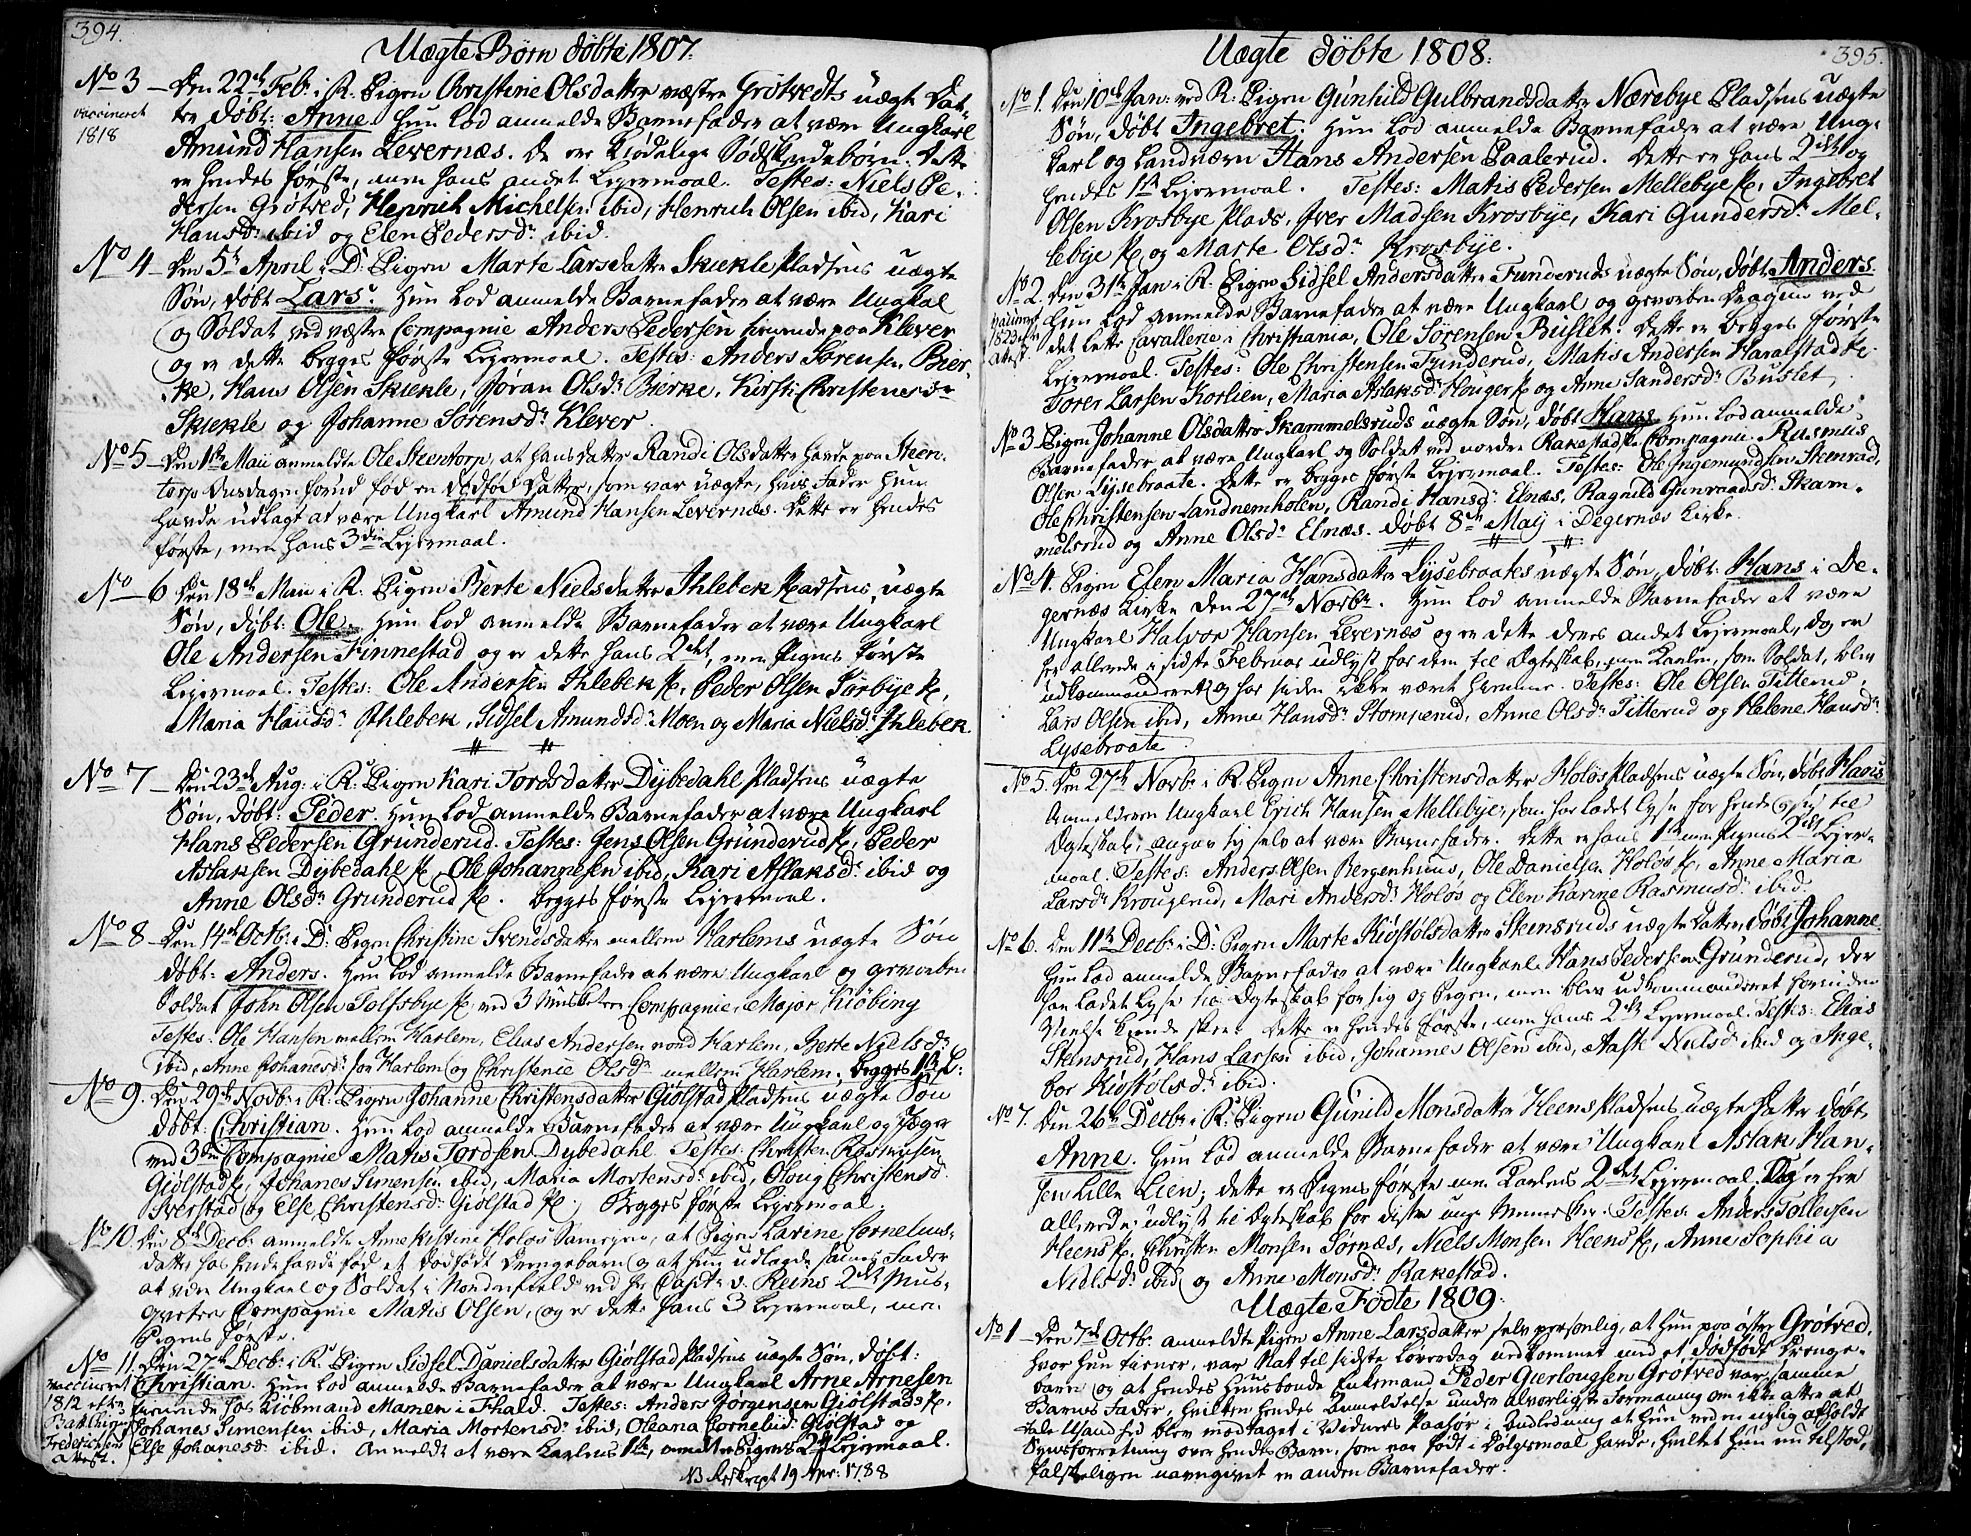 SAO, Rakkestad prestekontor Kirkebøker, F/Fa/L0005: Ministerialbok nr. I 5, 1784-1814, s. 394-395